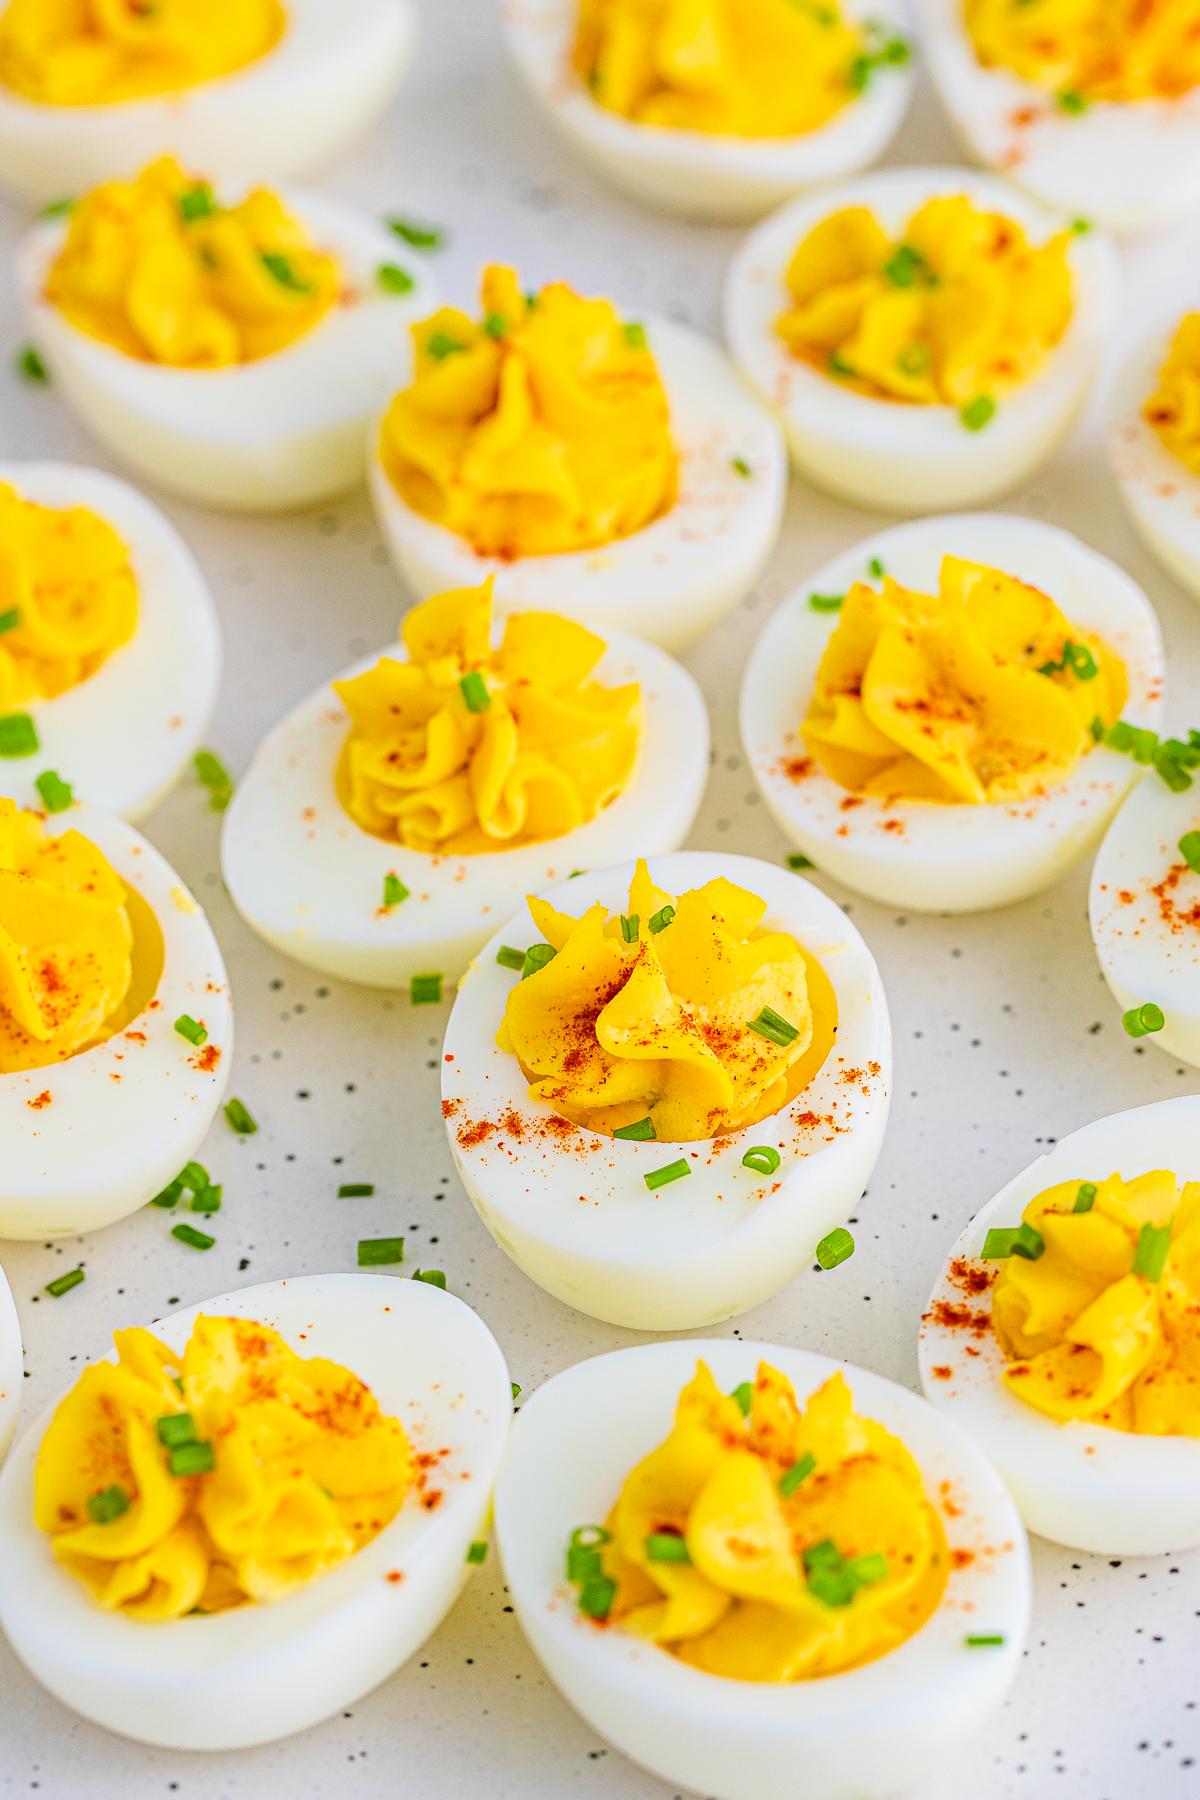 Close up of garnished eggs on white platter.